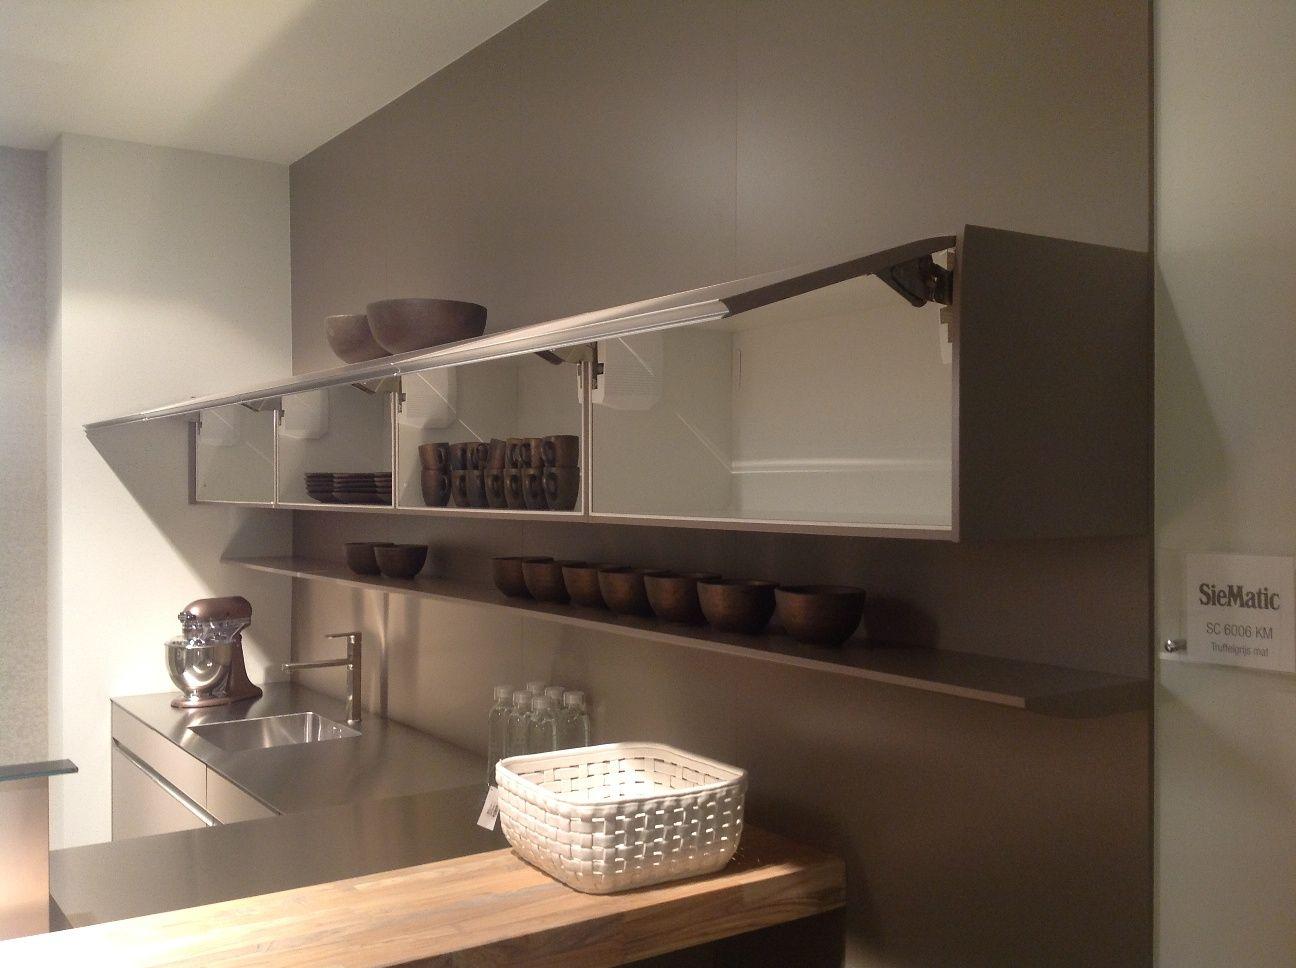 Allergrootste keukensite van nederland siematic luxe designkeuken greeploos - Modele en ingerichte keuken ...